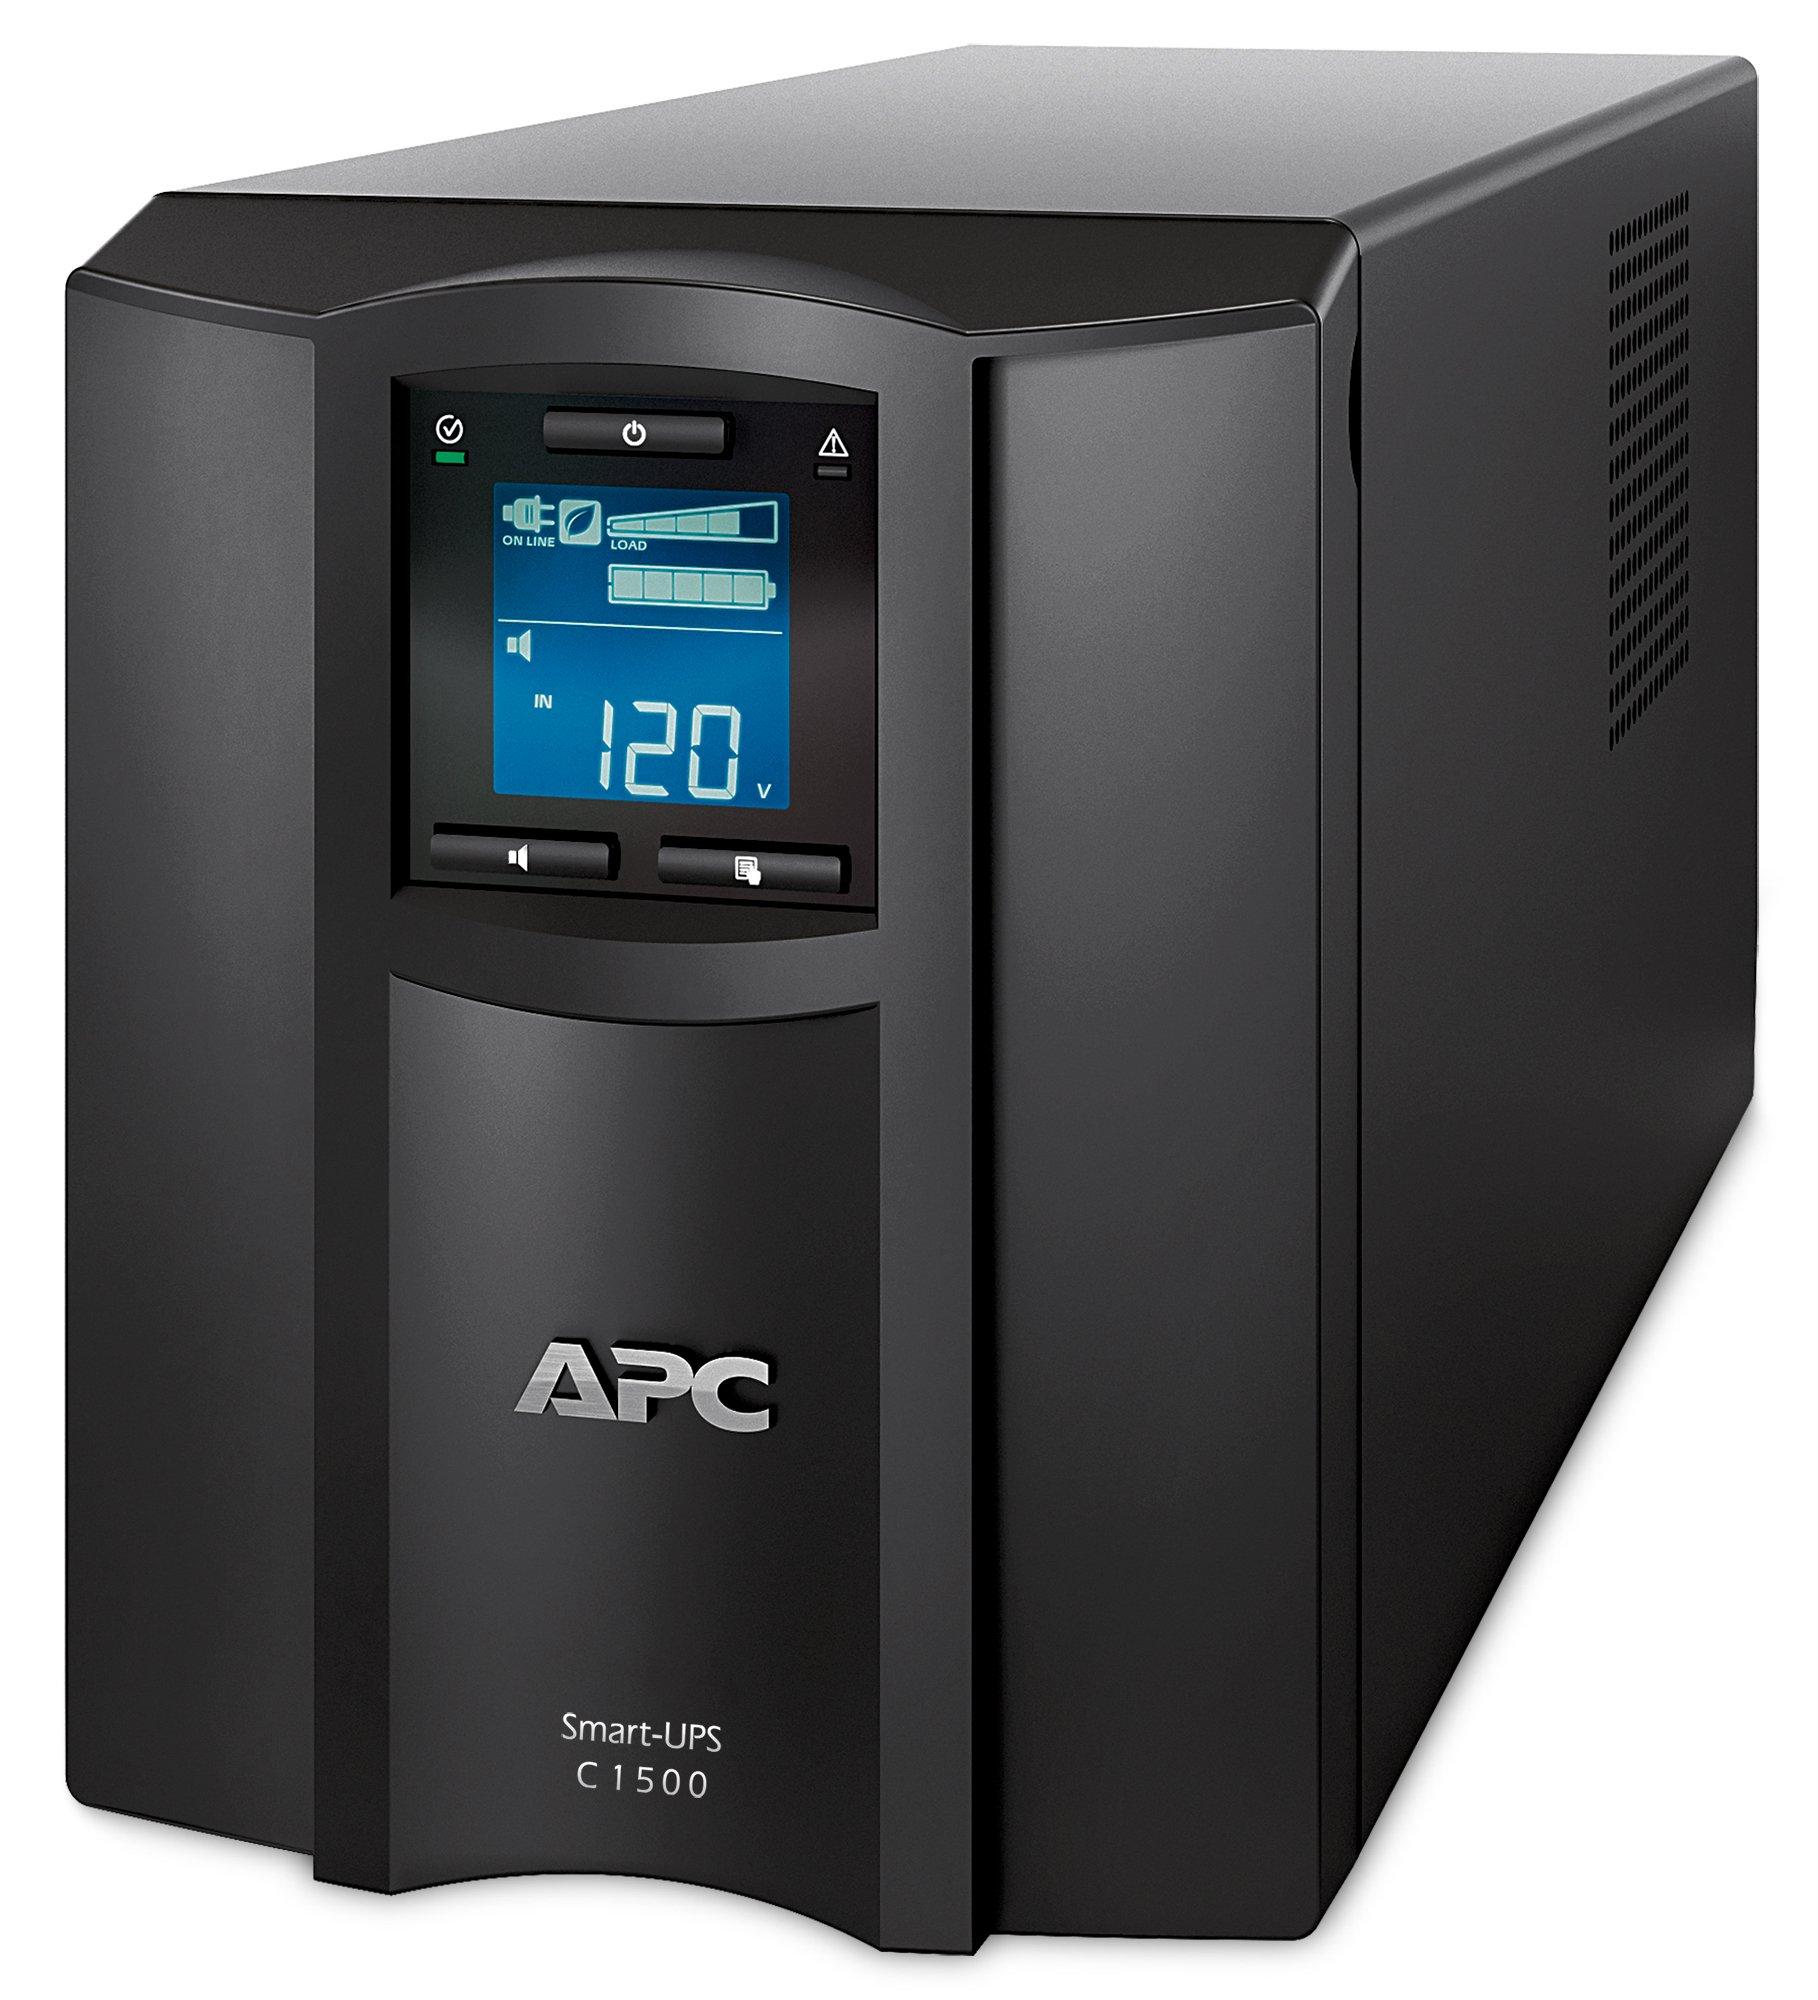 APC Smart-UPS with SmartConnect Remote Monitoring App, 1500VA UPS Sine Wave Battery Backup & Surge Protection (SMC1500C)